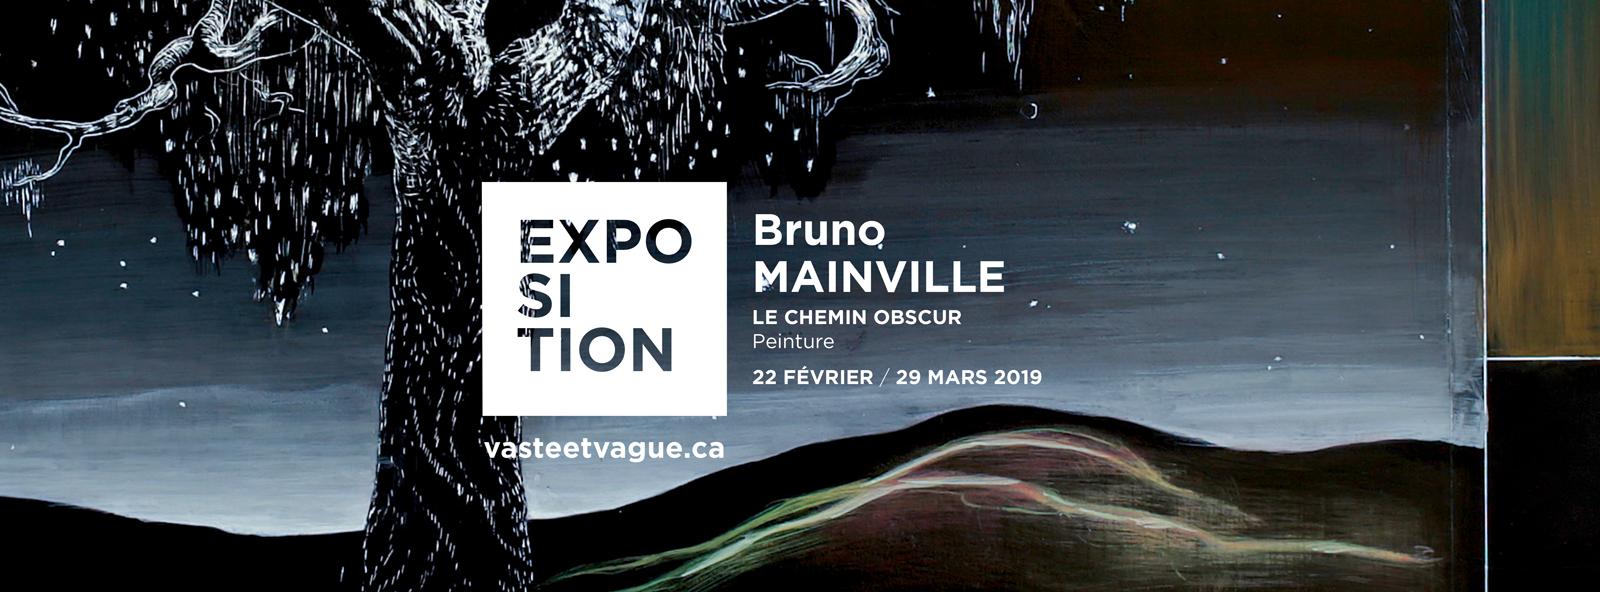 Bruno MAINVILLE | LE CHEMIN OBSCUR | Peinture